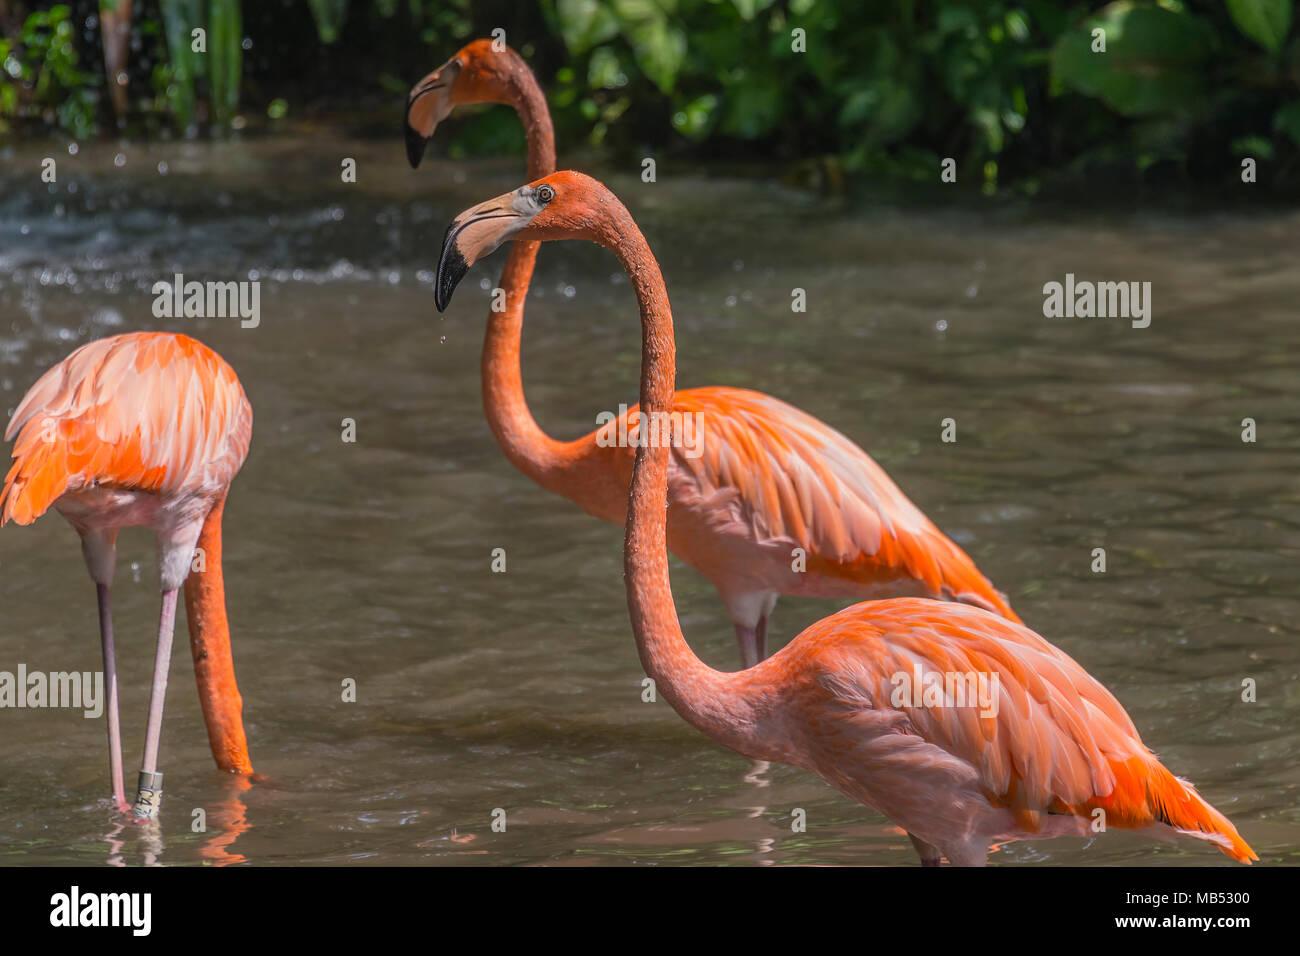 American or Caribbean flamingo, Jurong bird park, singapore Stock Photo